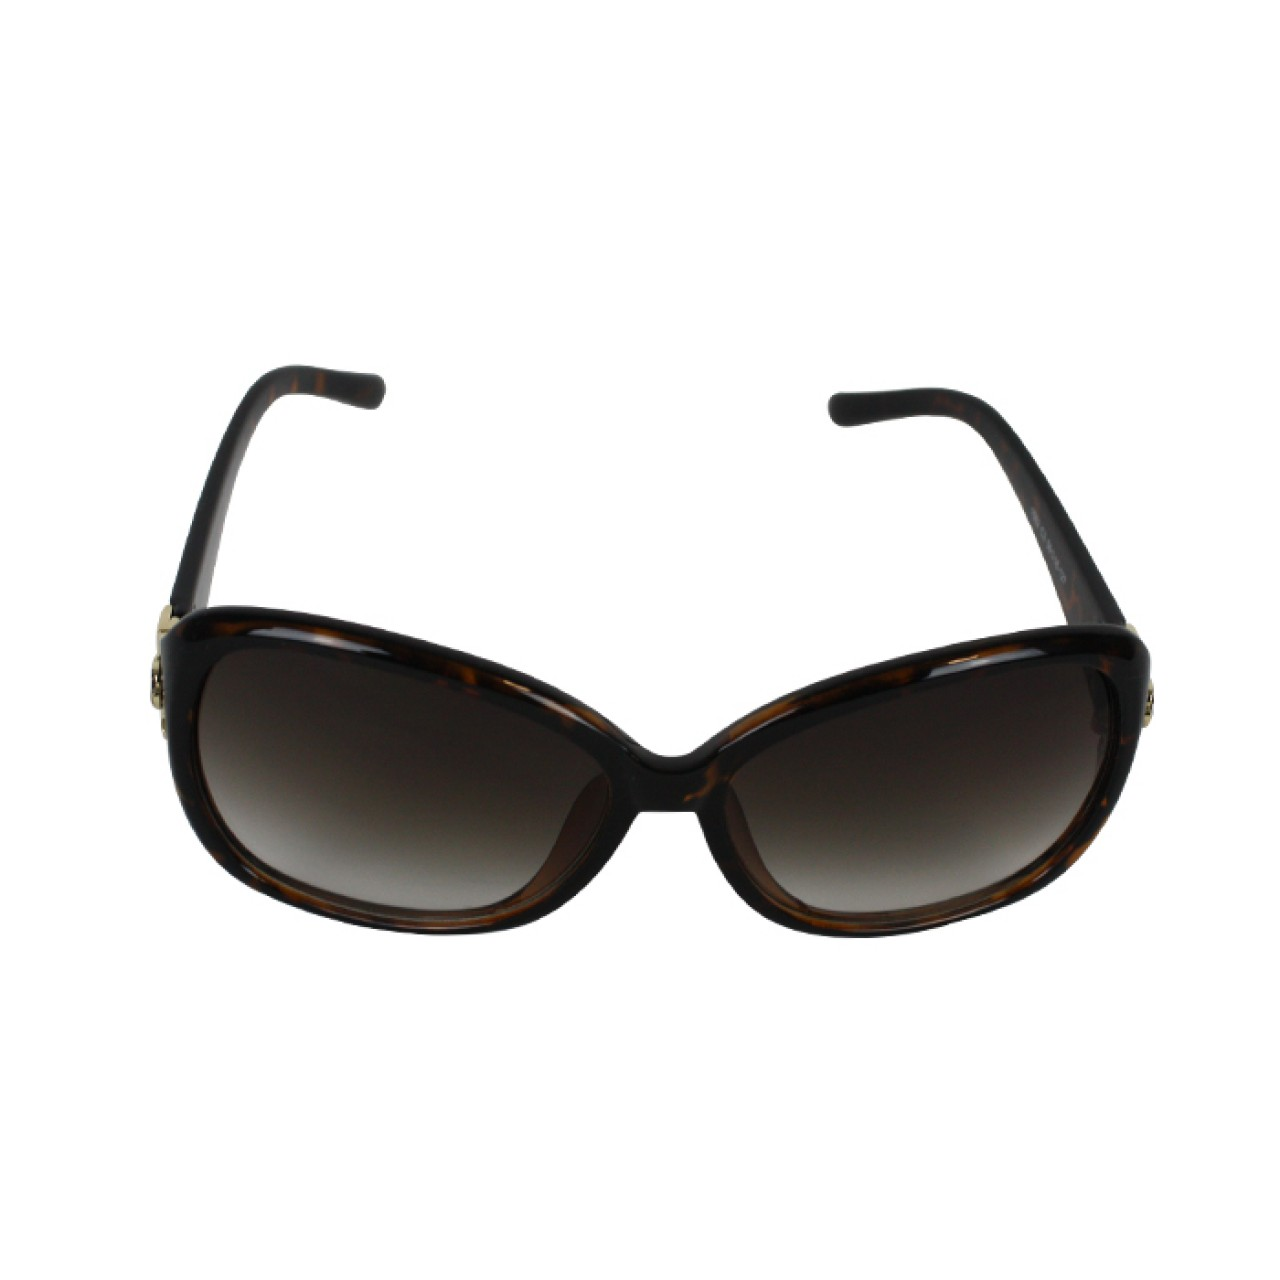 Chanel Flower Women's Smoke Tint Resin texture Sunglasses